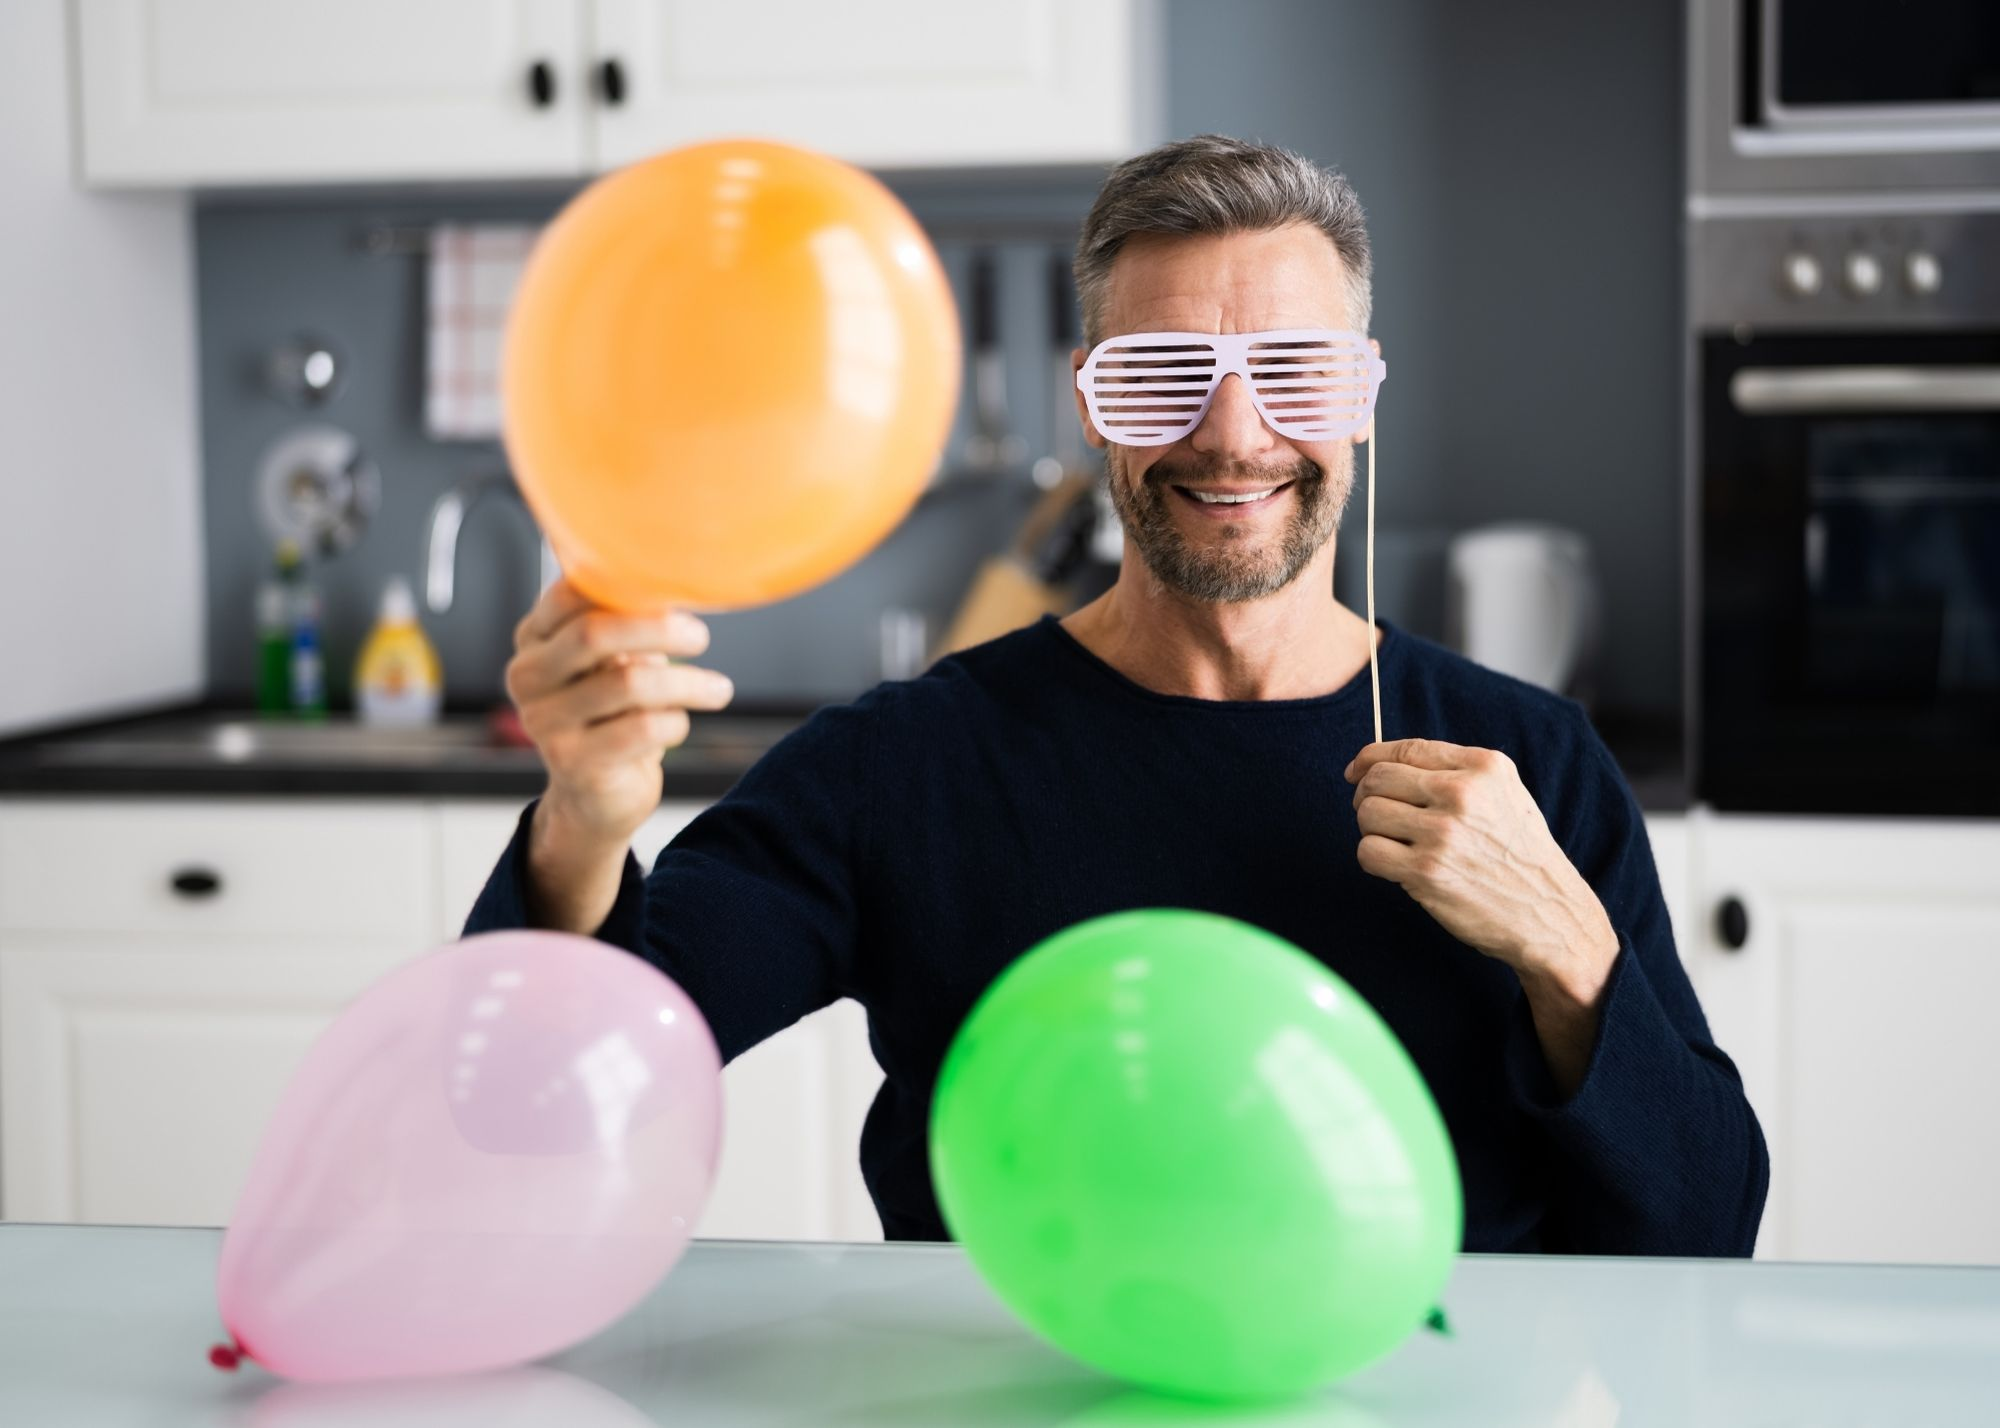 man with fun birthday props